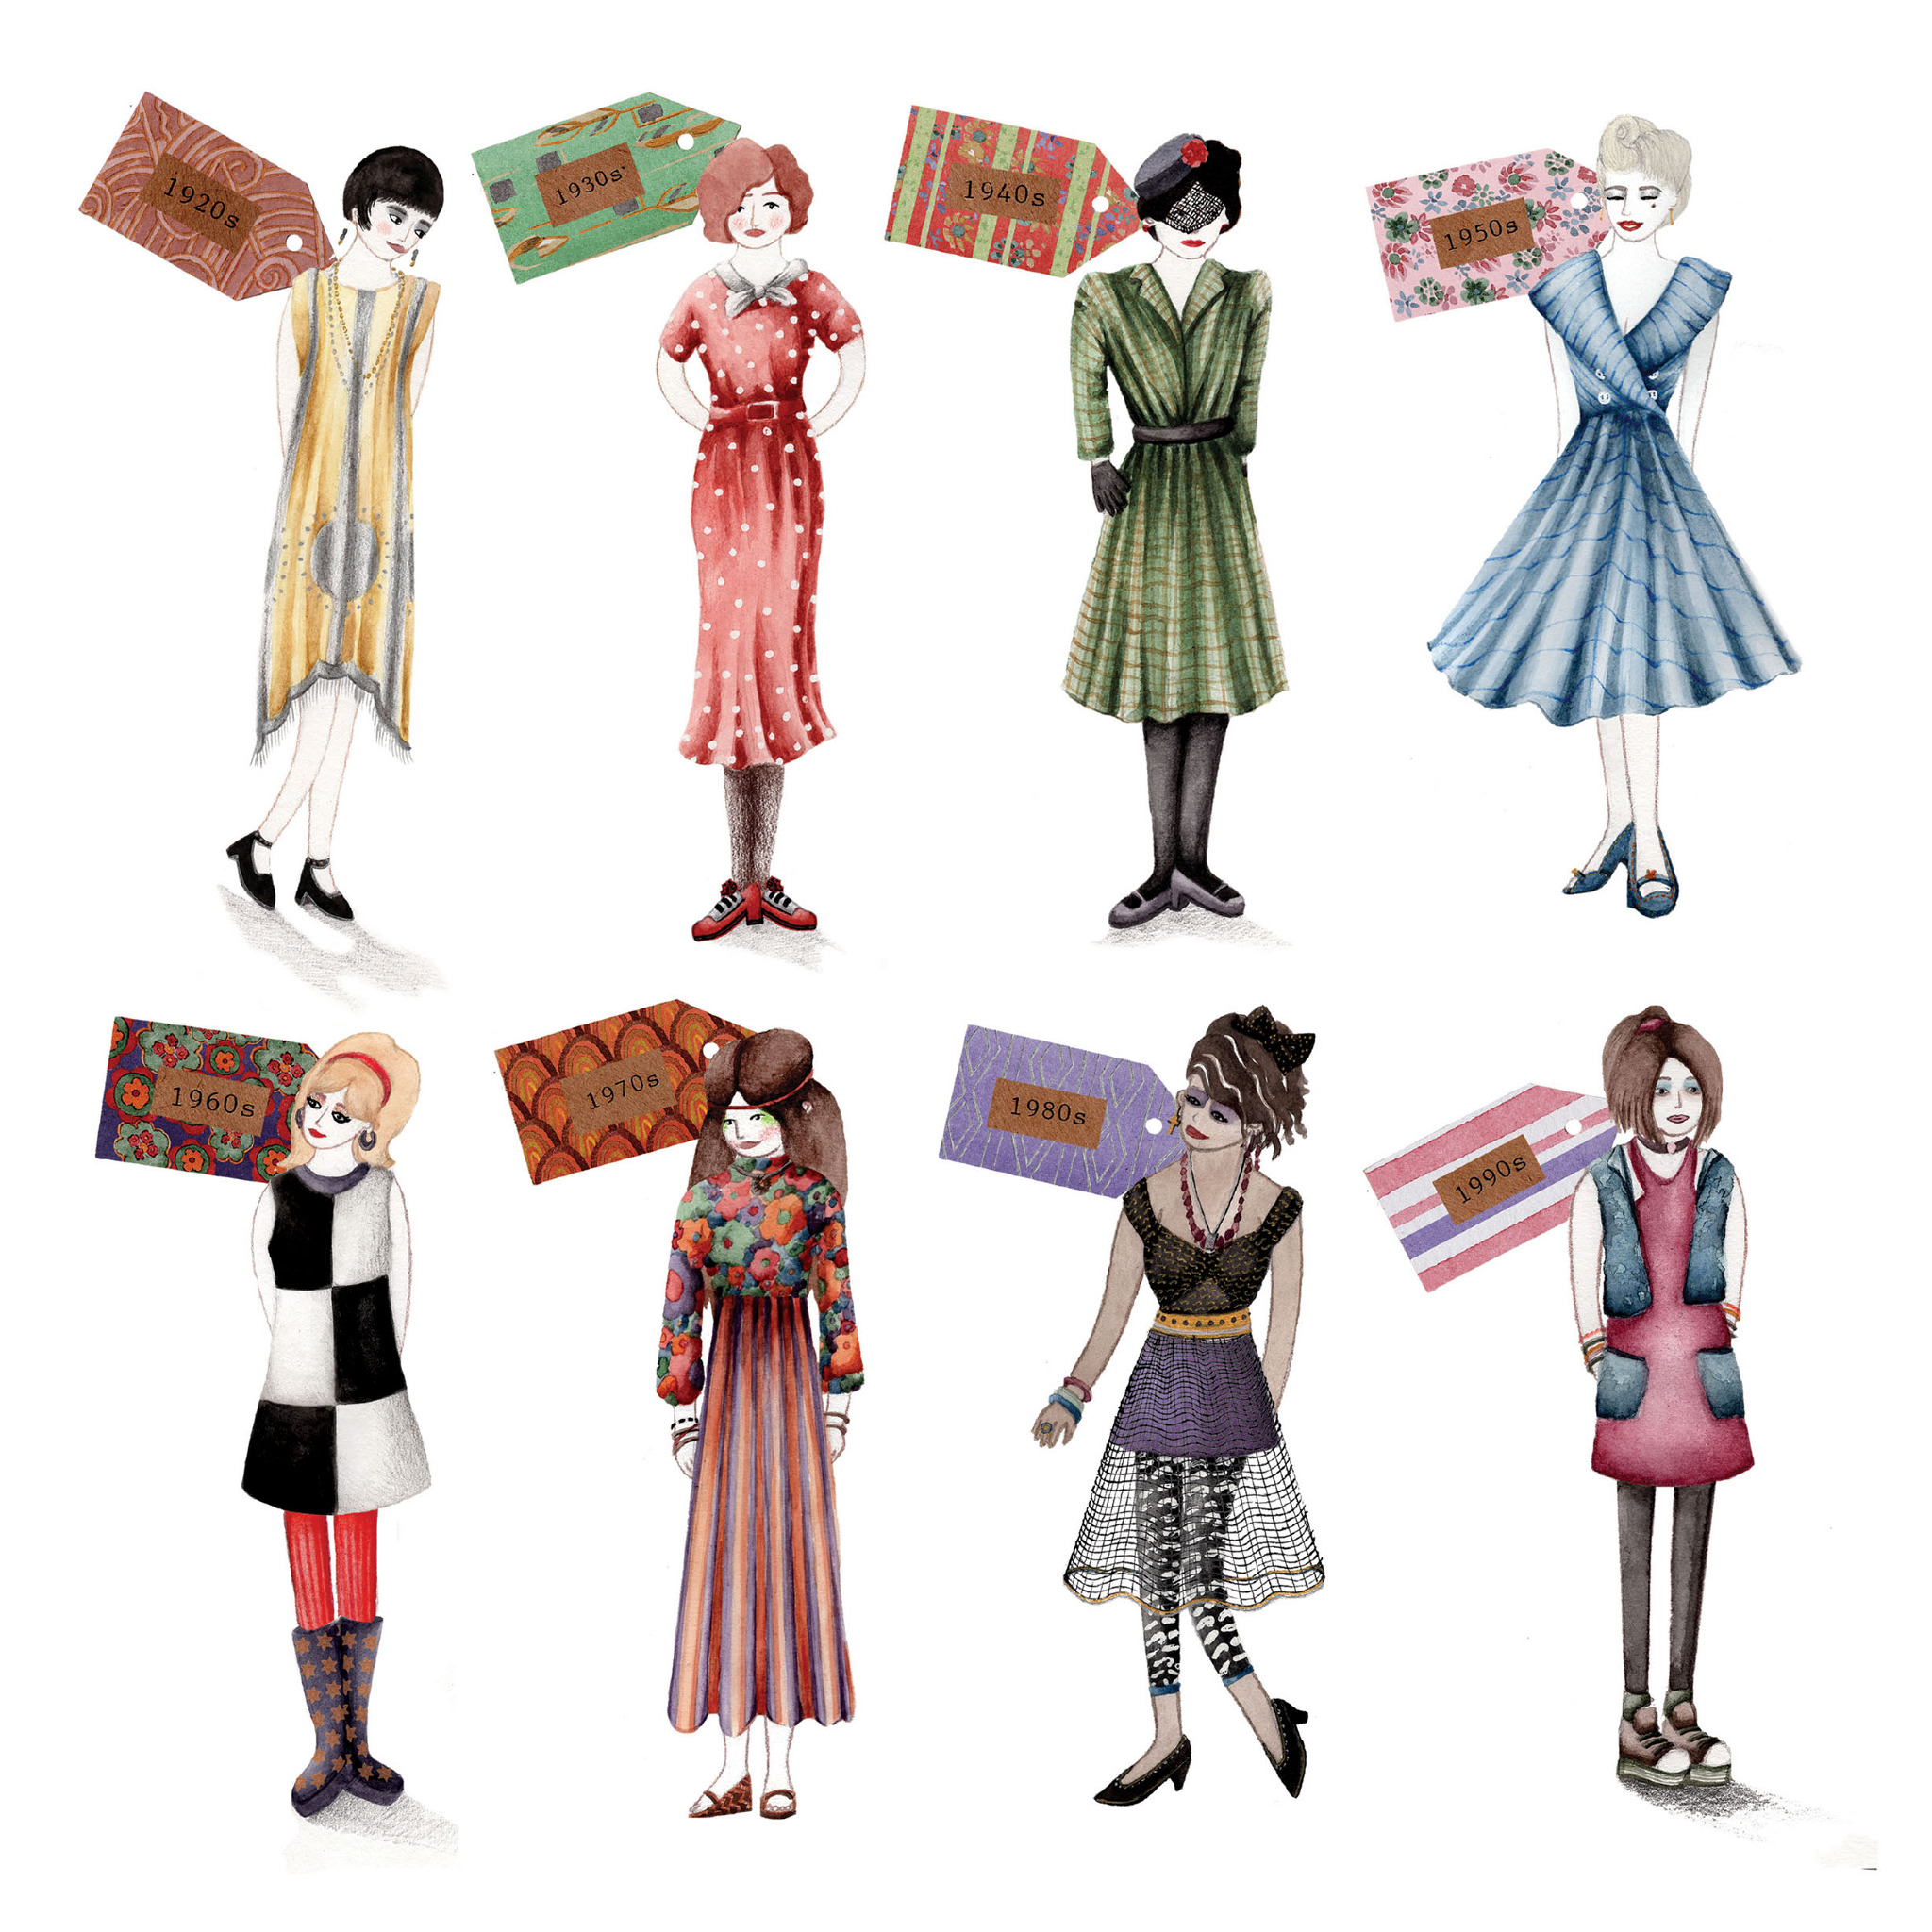 Vintage Clothing Illustrations - Laura Hallett Art and Illustration